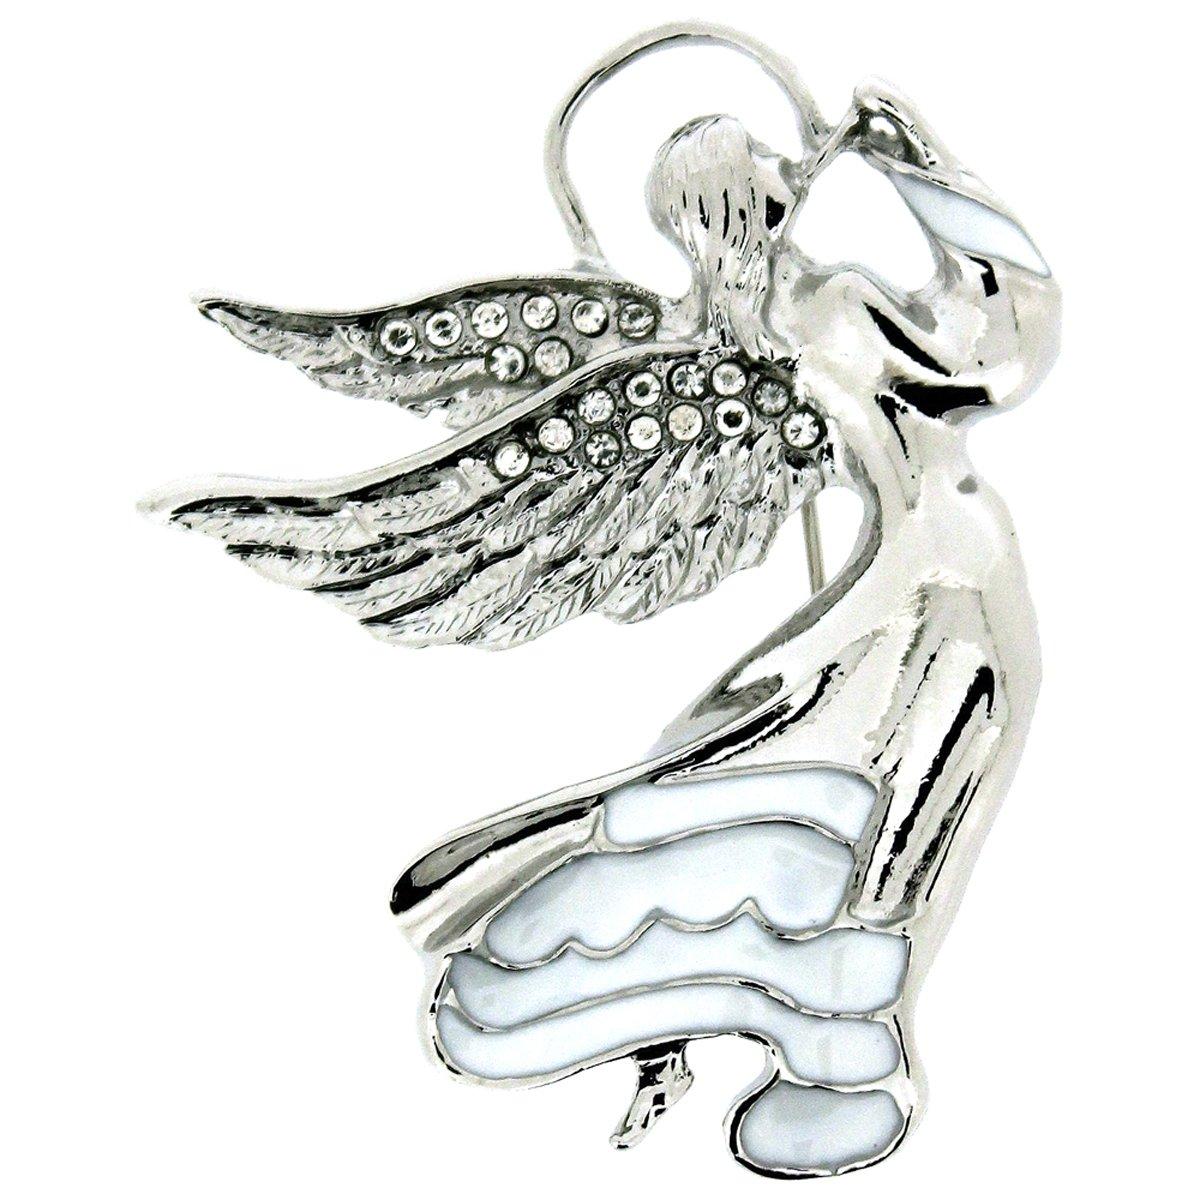 PYNK Jewellery Broche en argent et cristaux Swarovski transparents Motif ange gardien volant 11002683